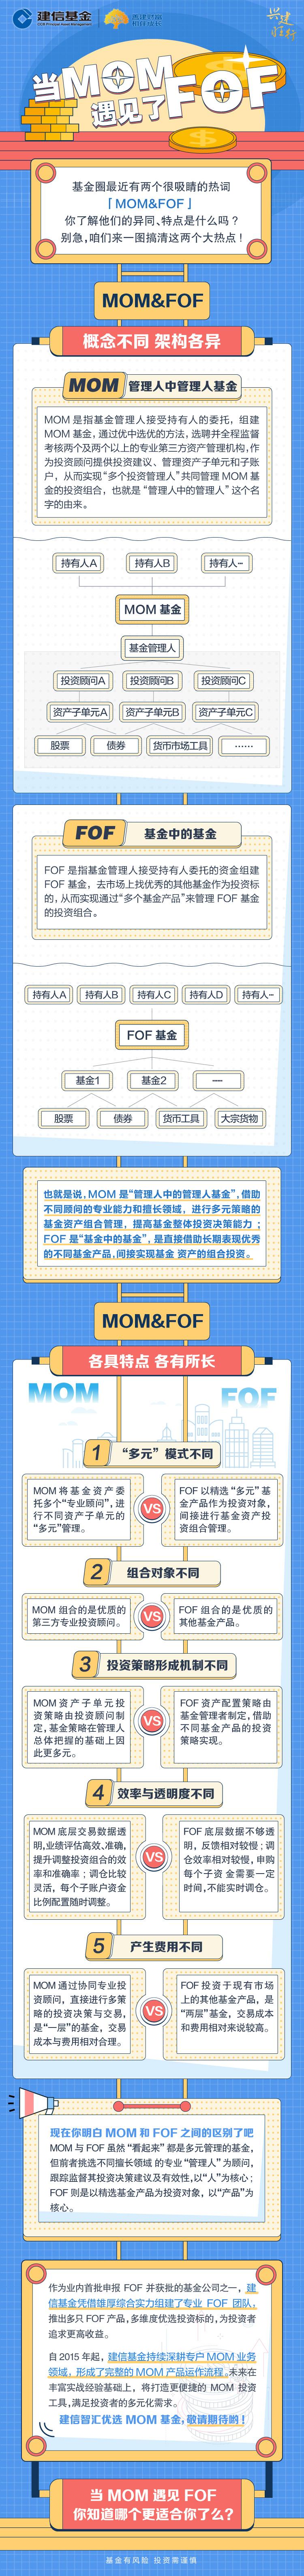 MOM和FOF大PK,你PICK哪一个?